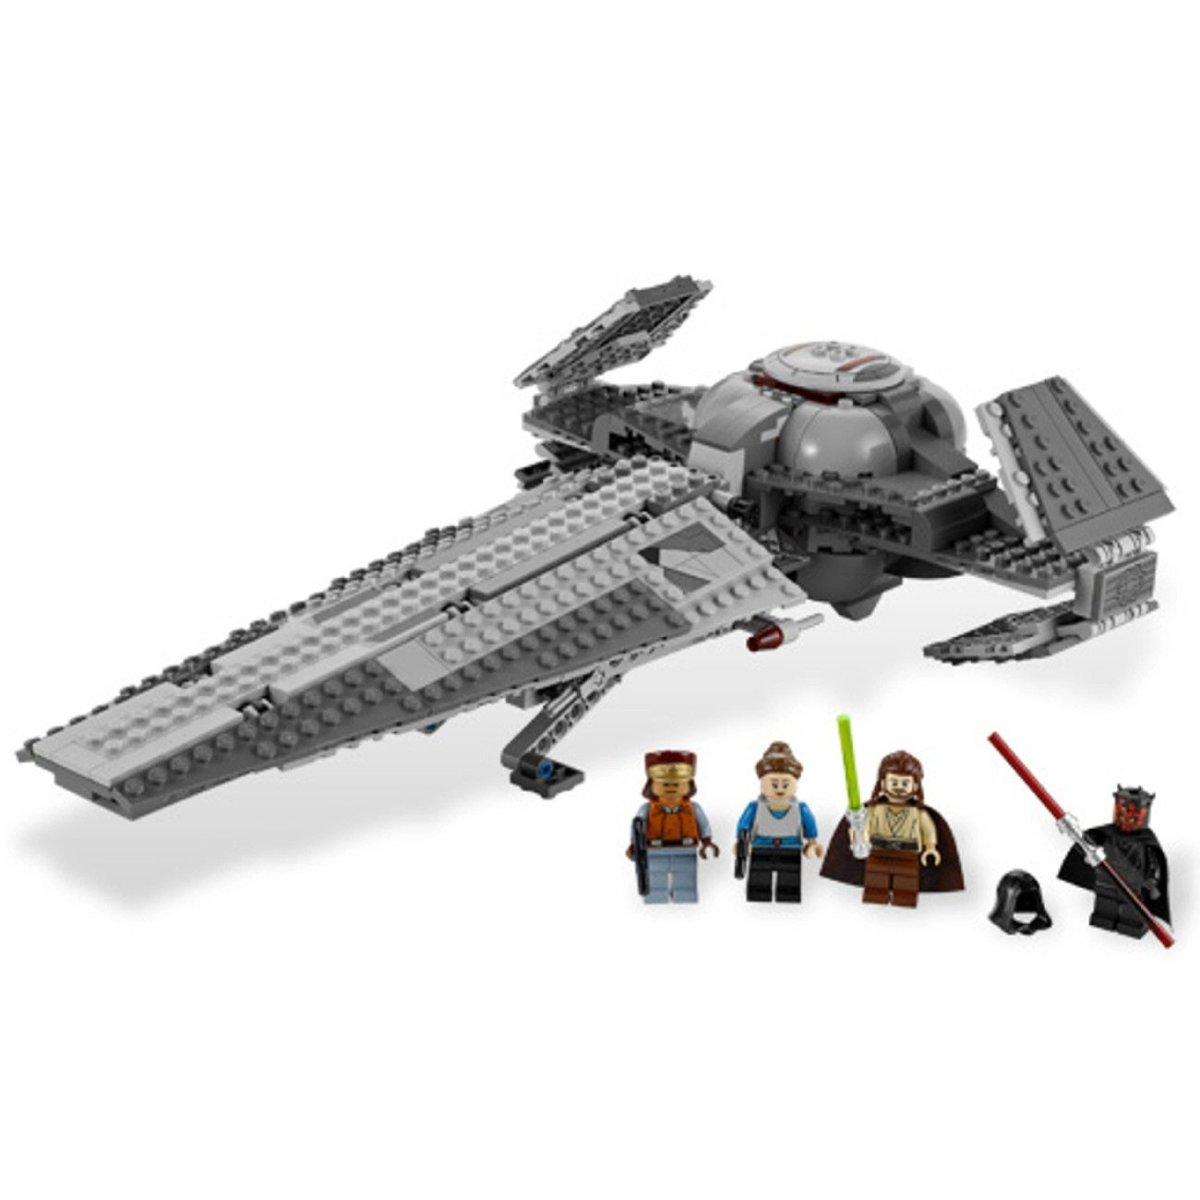 LEGO Star Wars Darth Maul's Sith Infiltrator 7961 Assembled